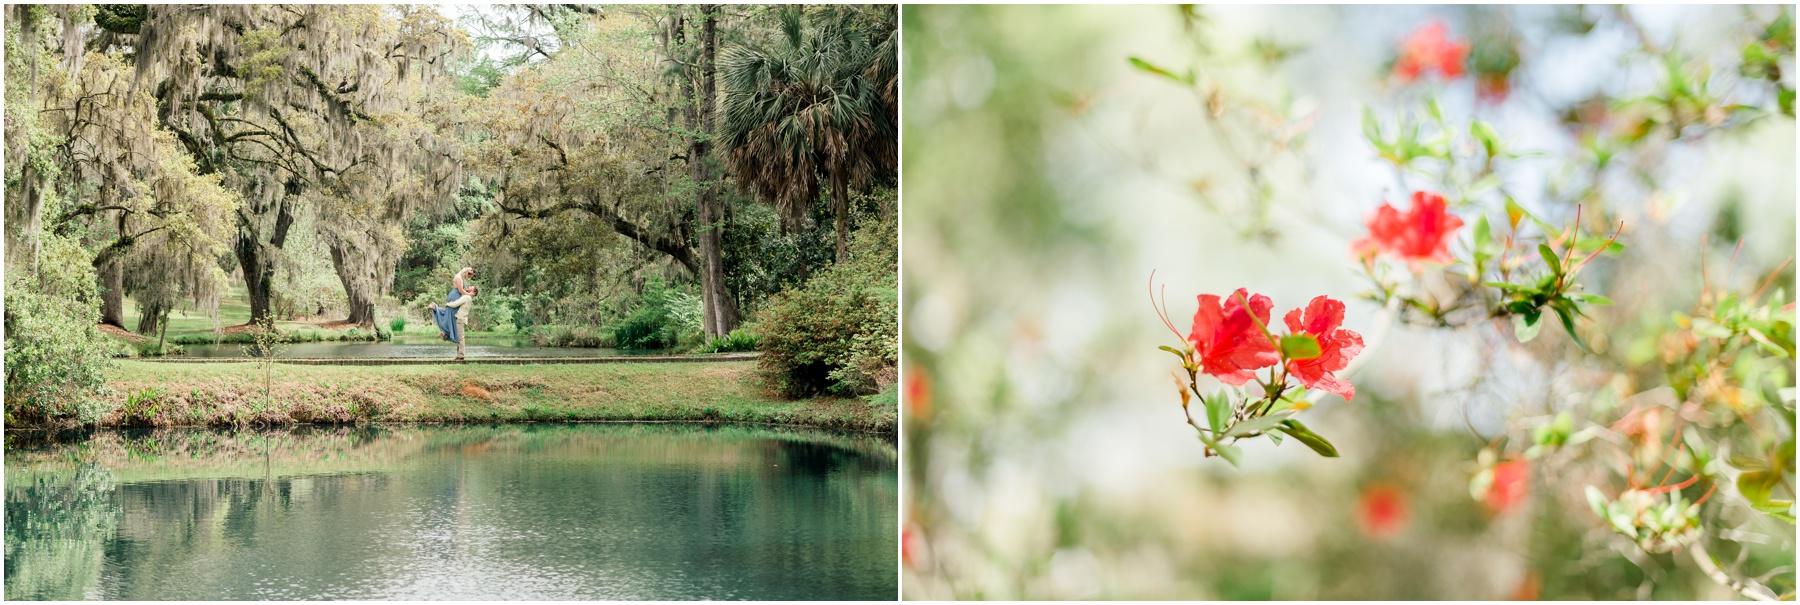 Mepkin-Abbey-Moncks-Corner-South-Carolina-Engagement-Session-Photos_0010.jpg